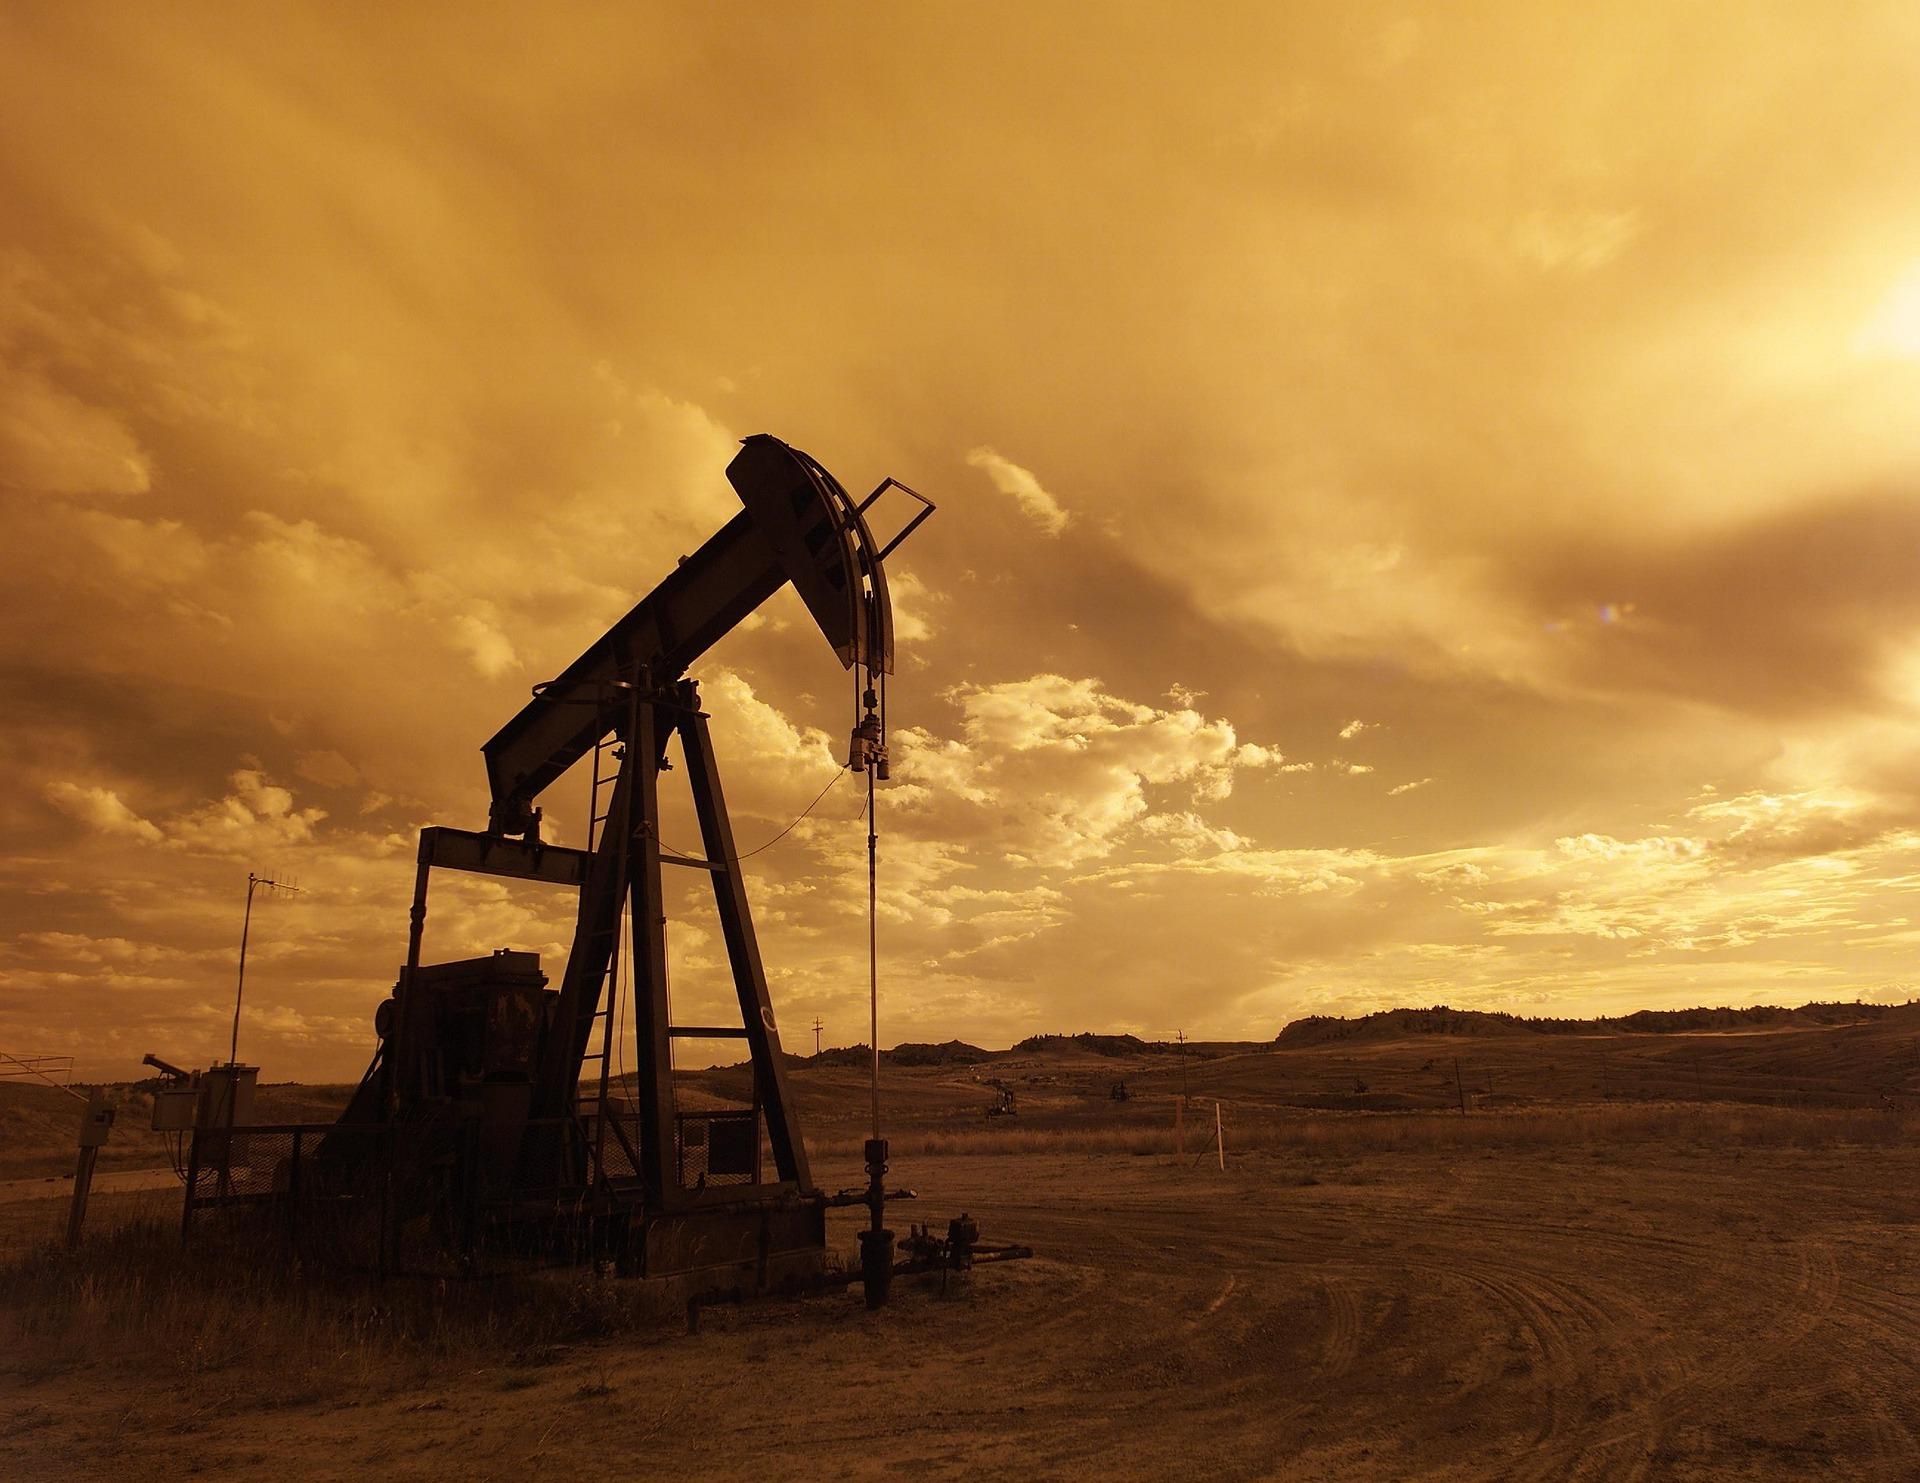 oil-pump-jack-1407715_1920